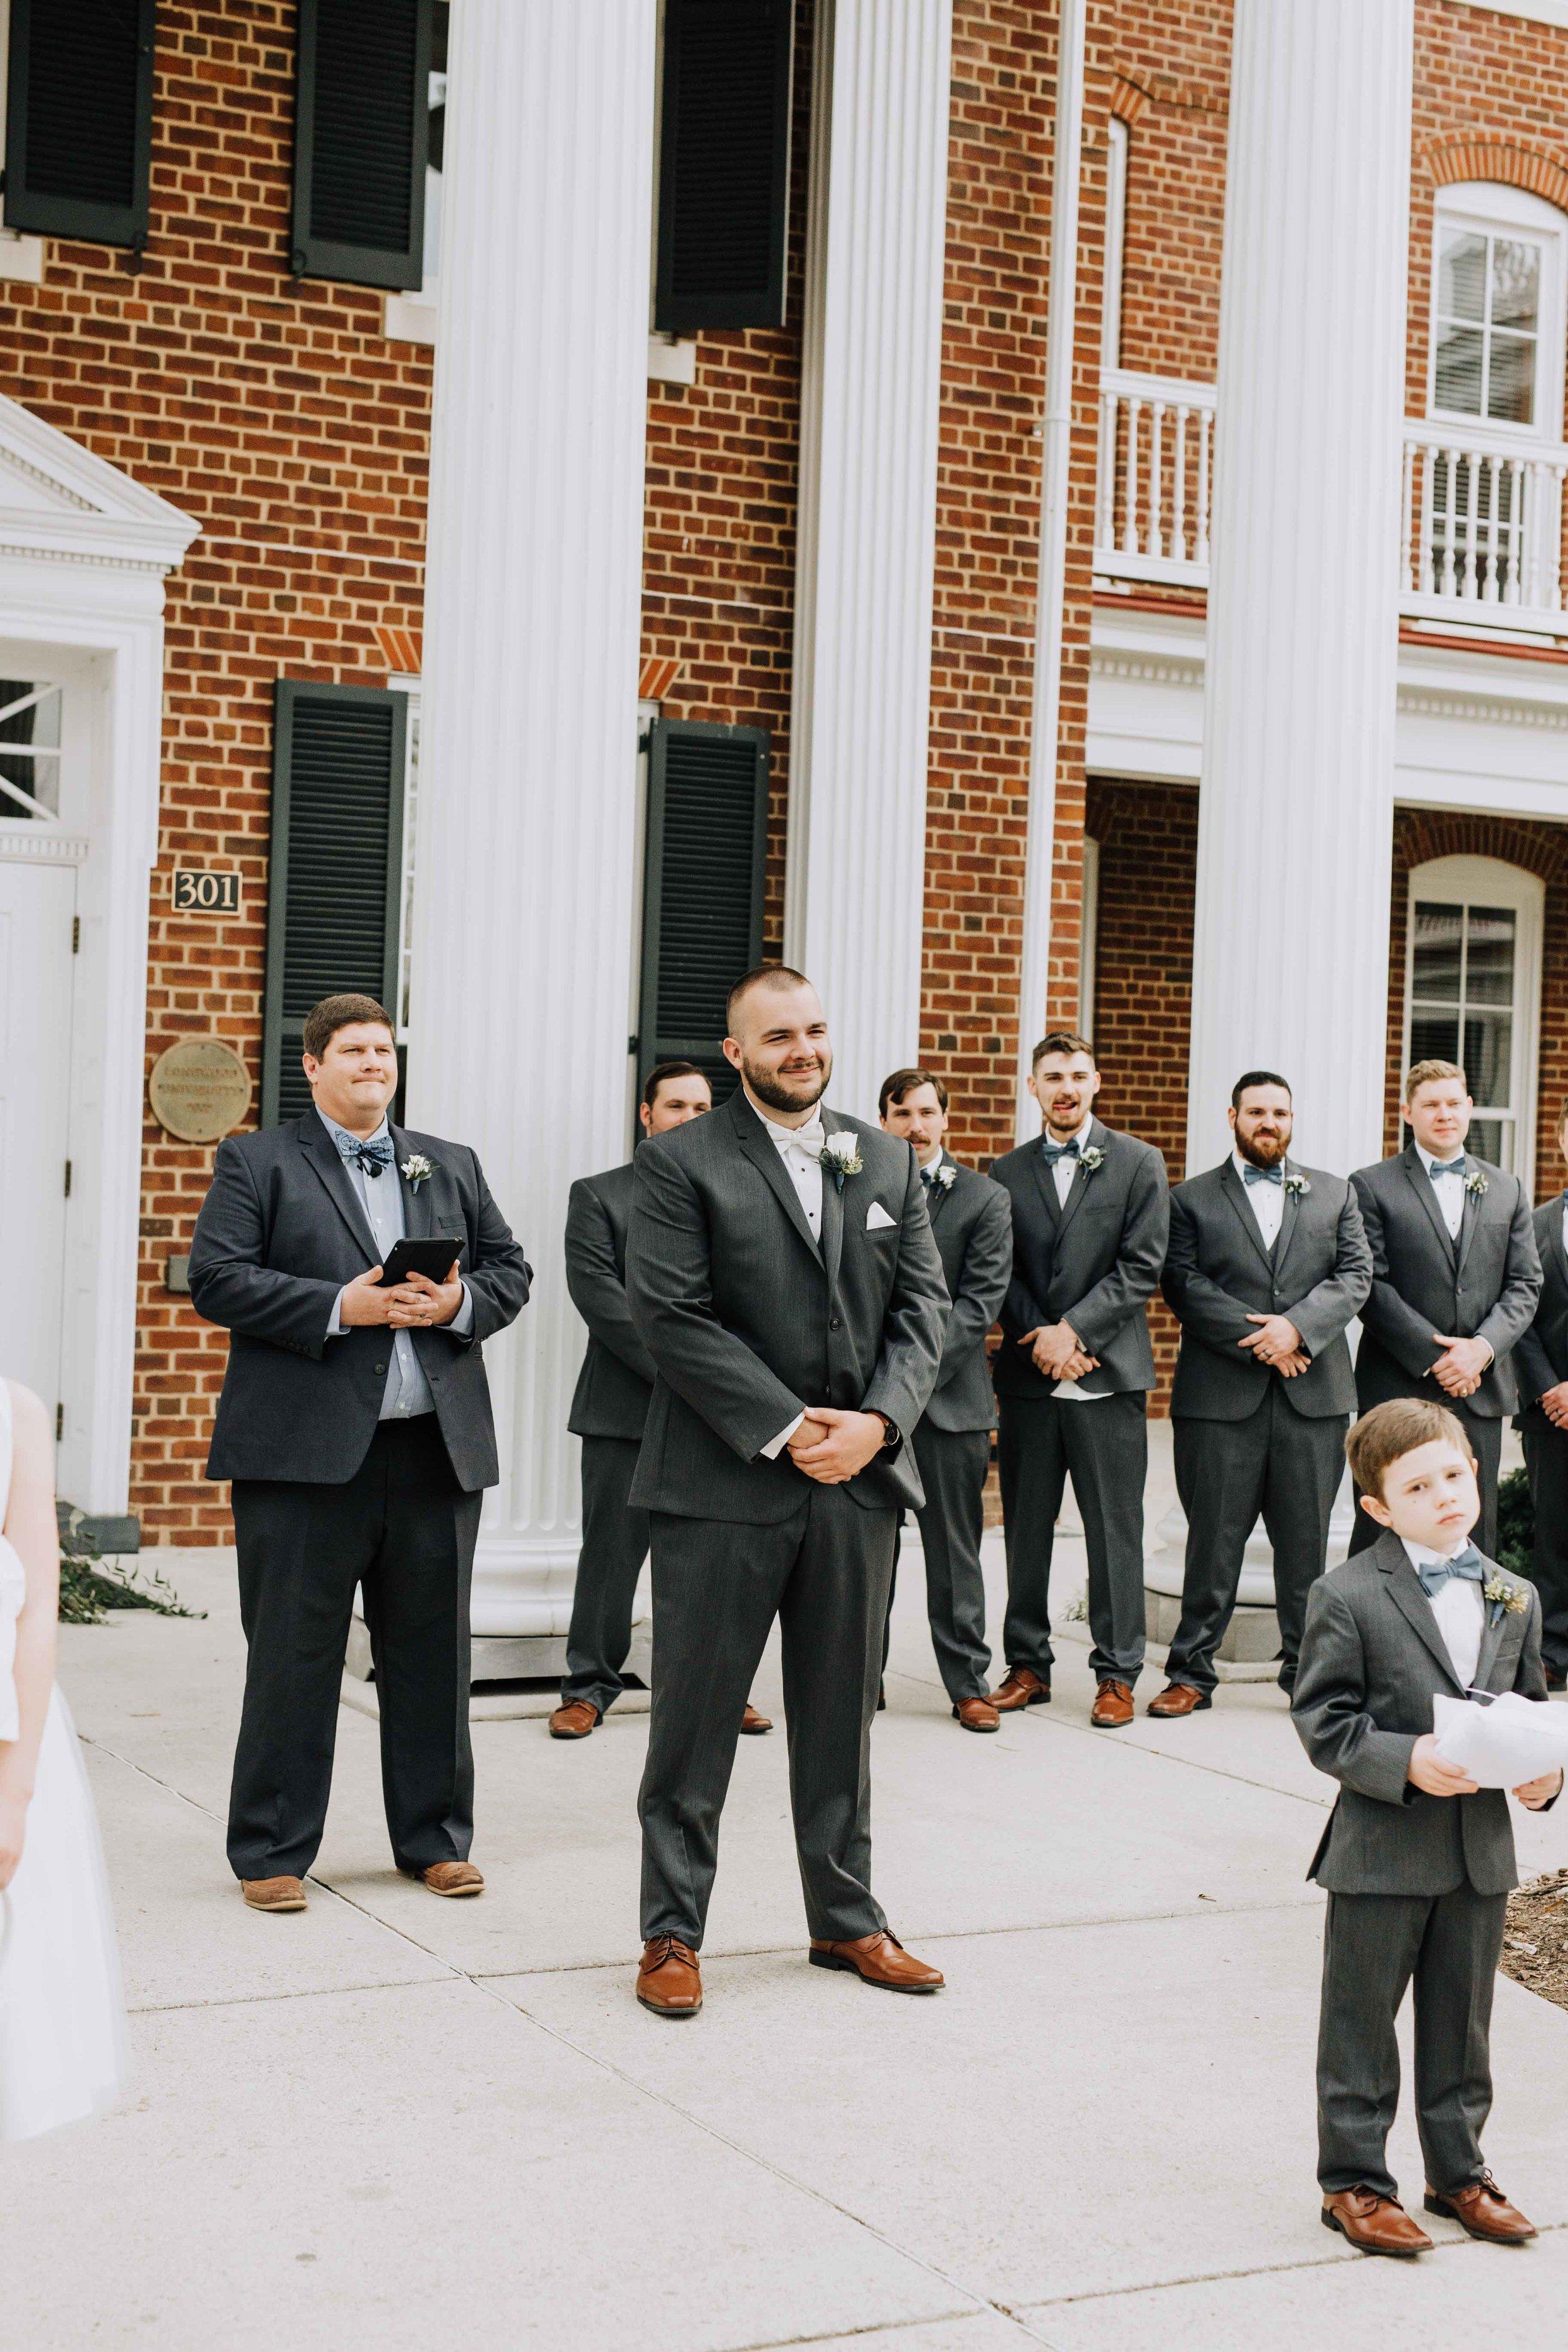 Farmville-Virginia-Wedding-Hotel-Weynoke-Downtown-Jacqueline-Waters-Photography-Detailed- (774).jpg